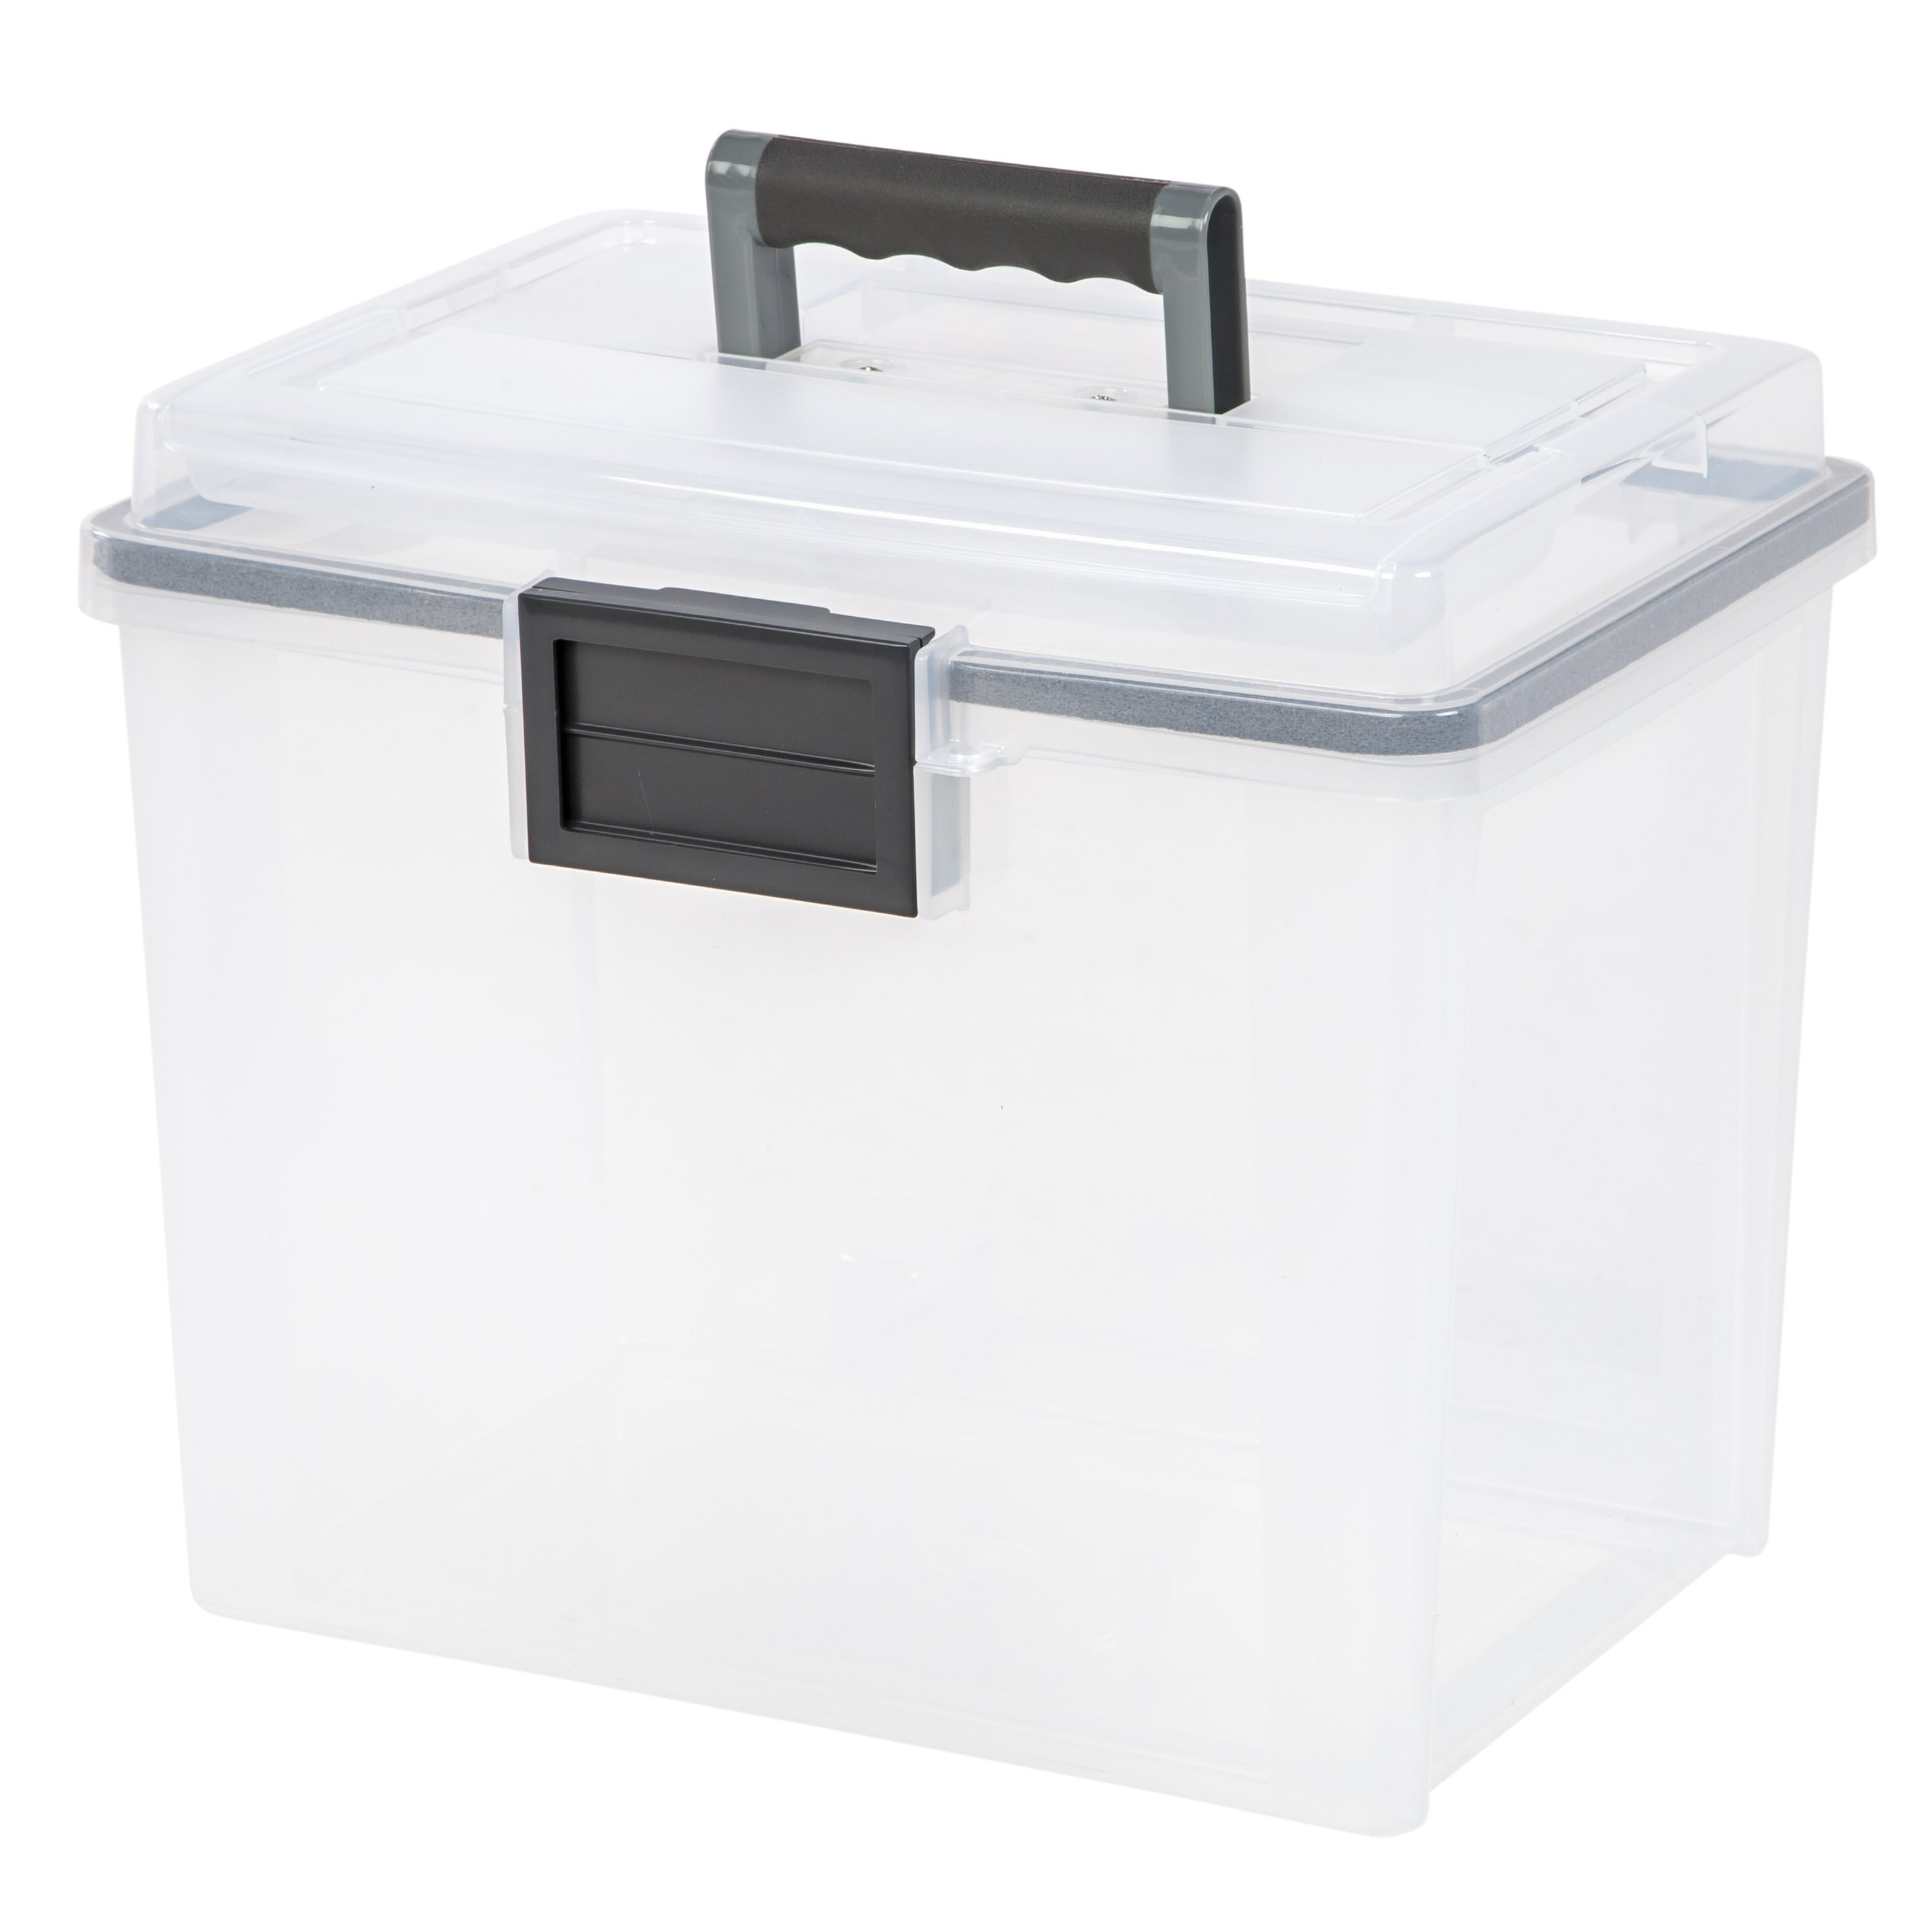 iris letter size portable weathertight file box reviews With letter size portable file box